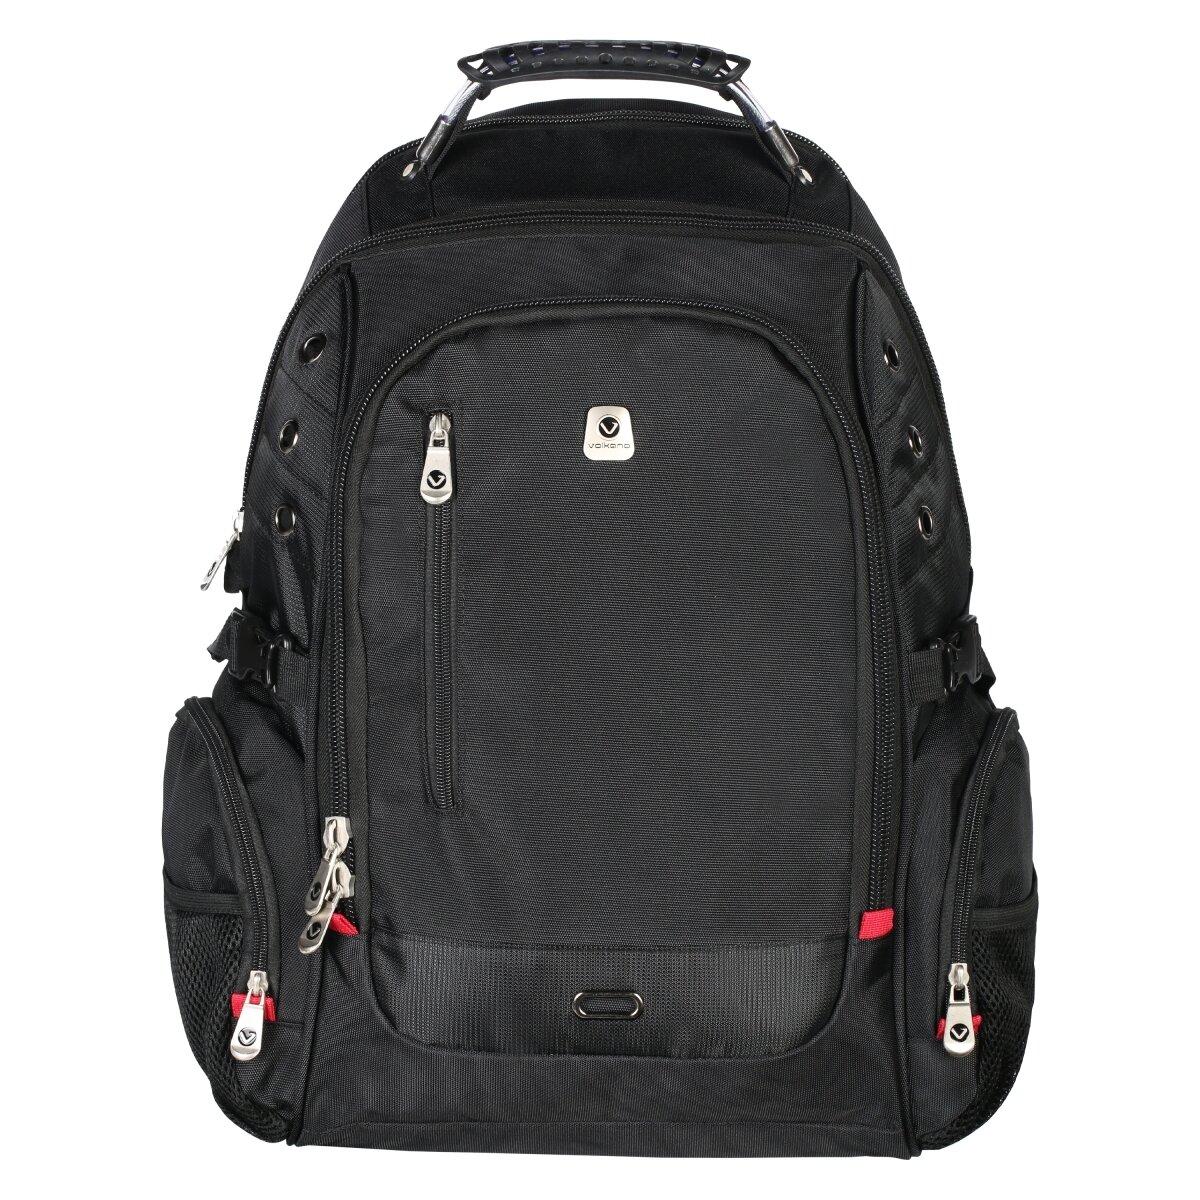 "Volkano Backpack 16"" Tough series"